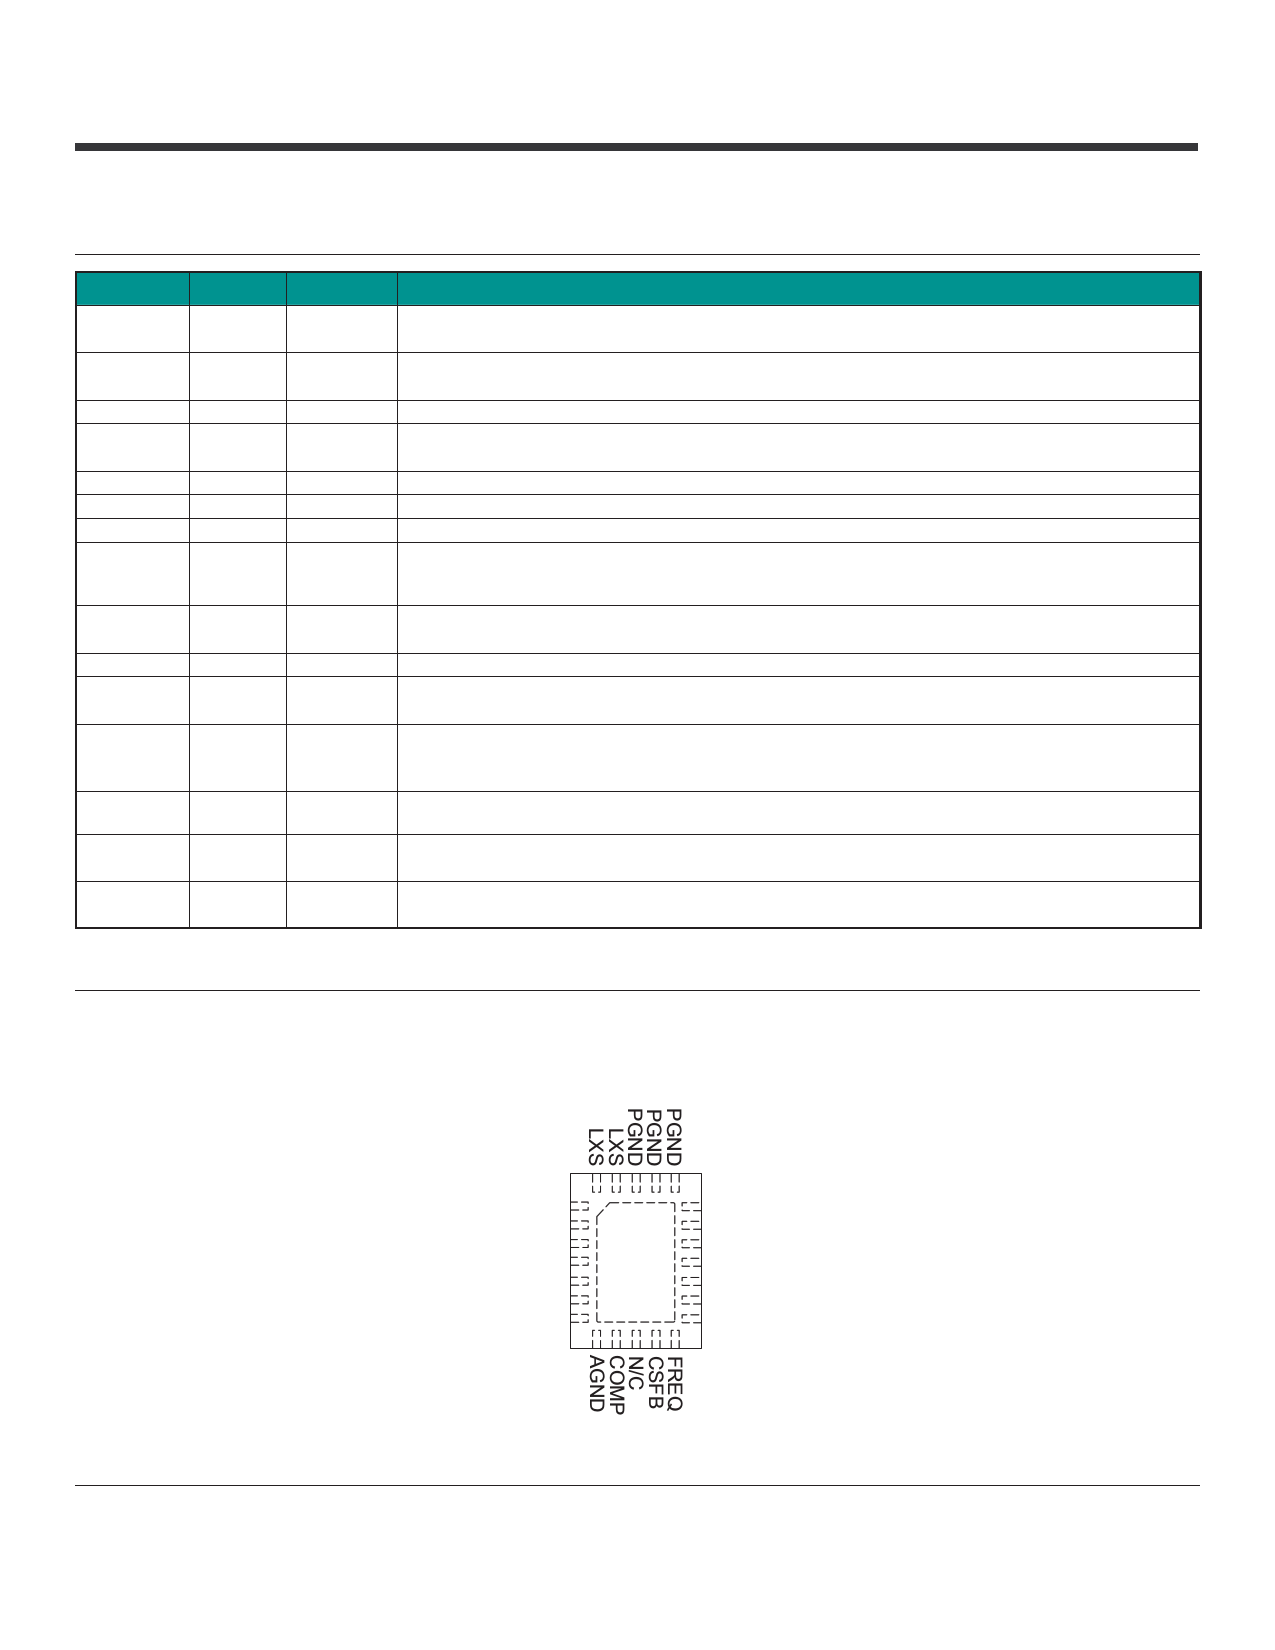 AAT2404 pdf, schematic